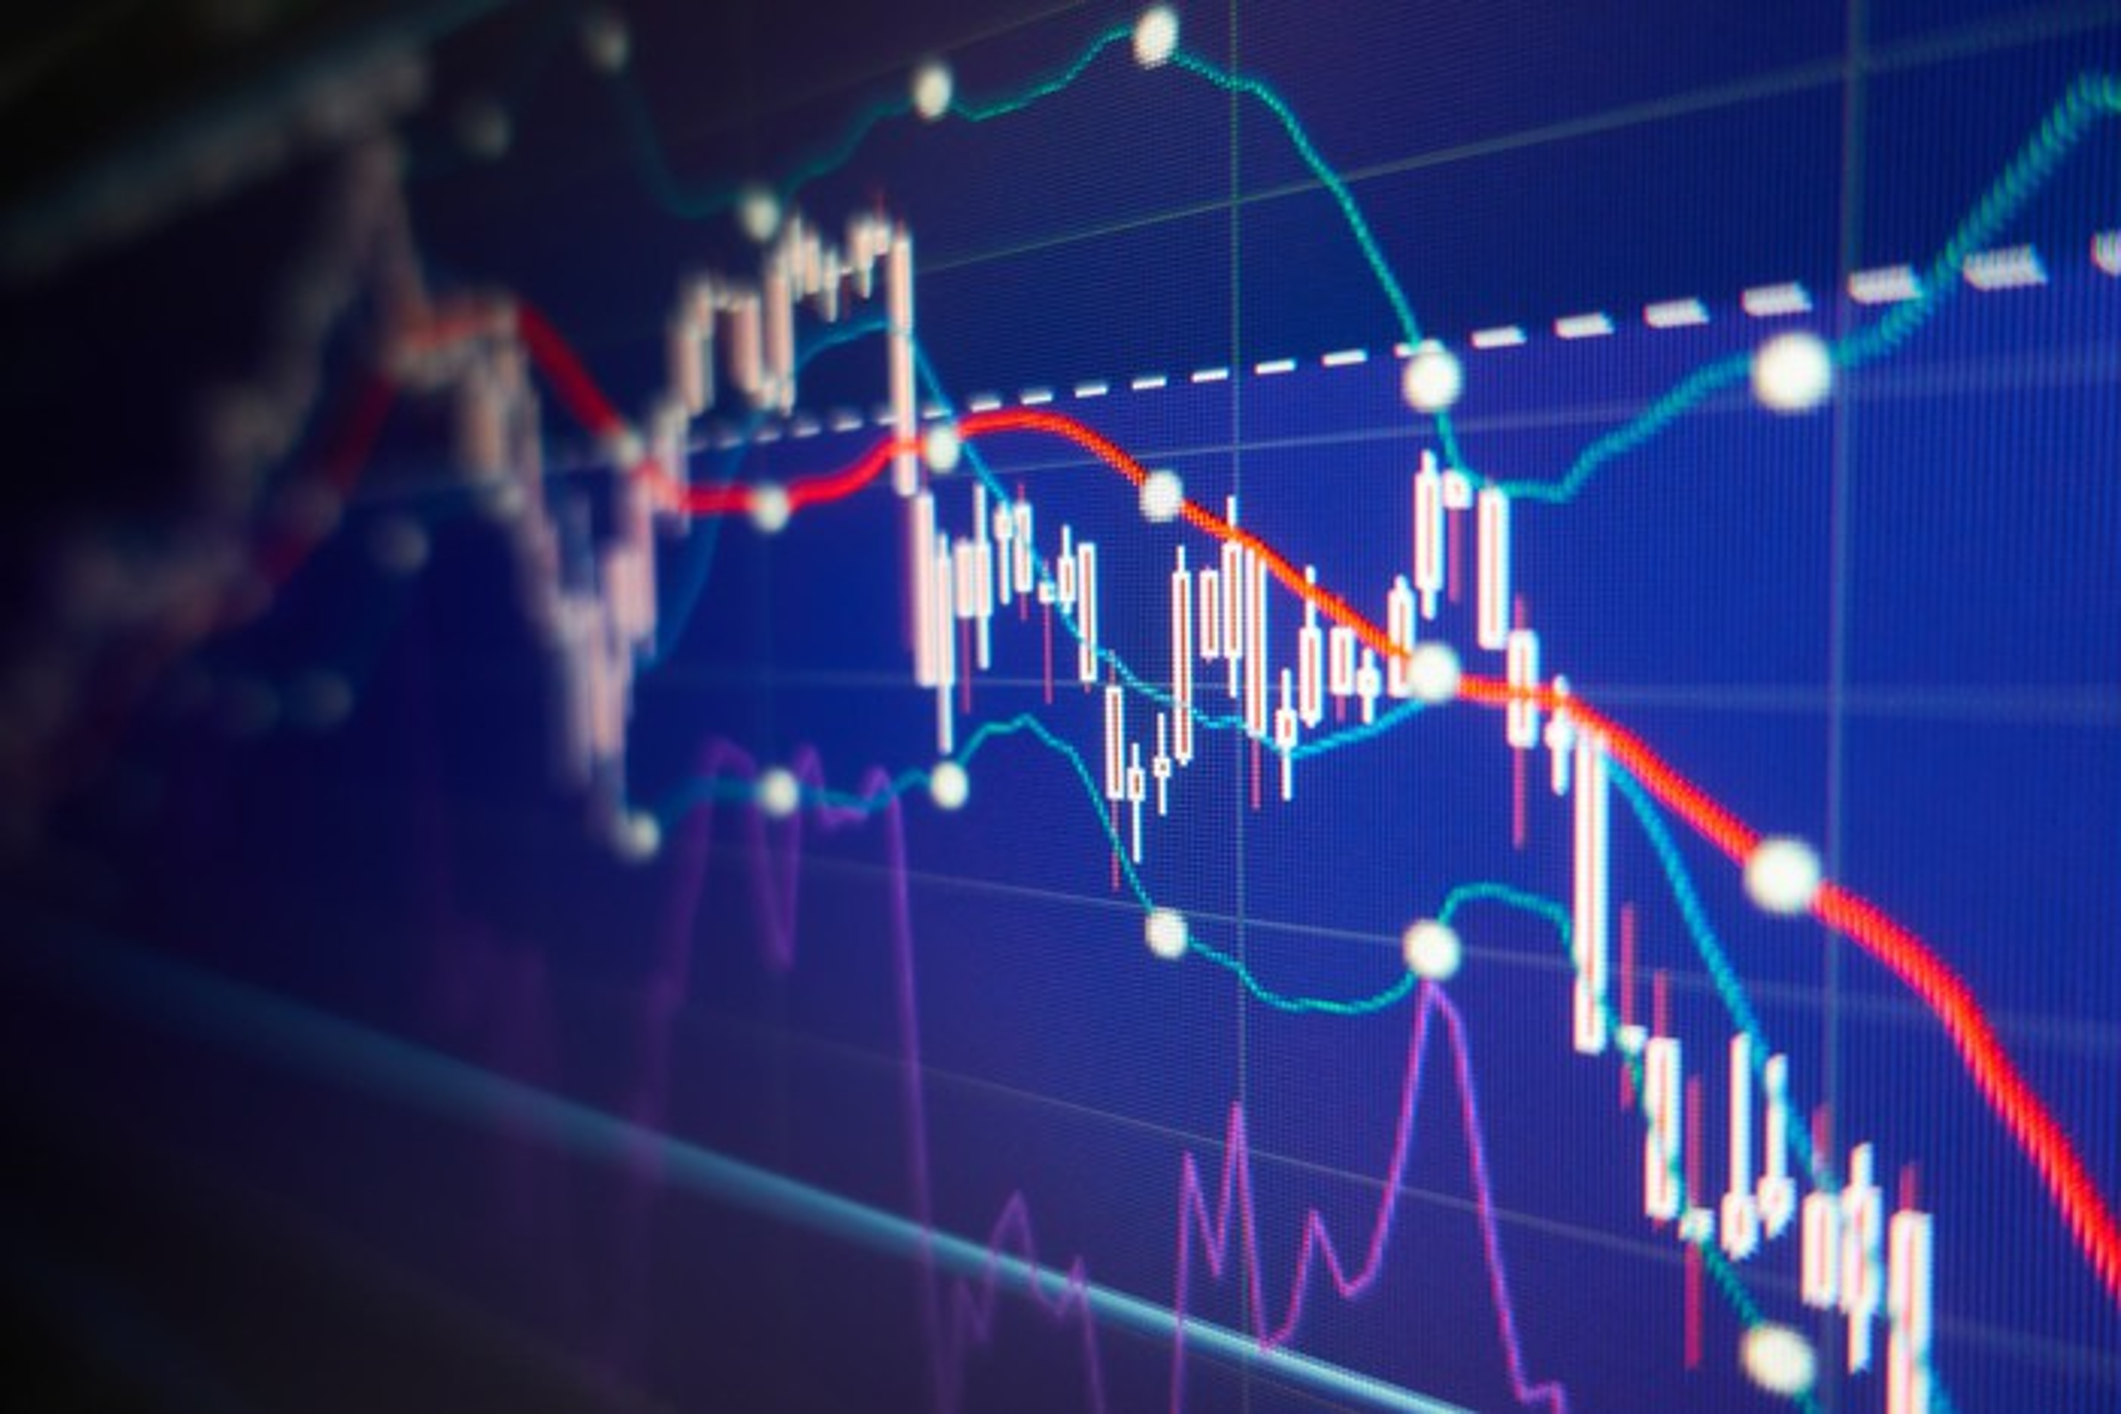 Falling stock graphs.